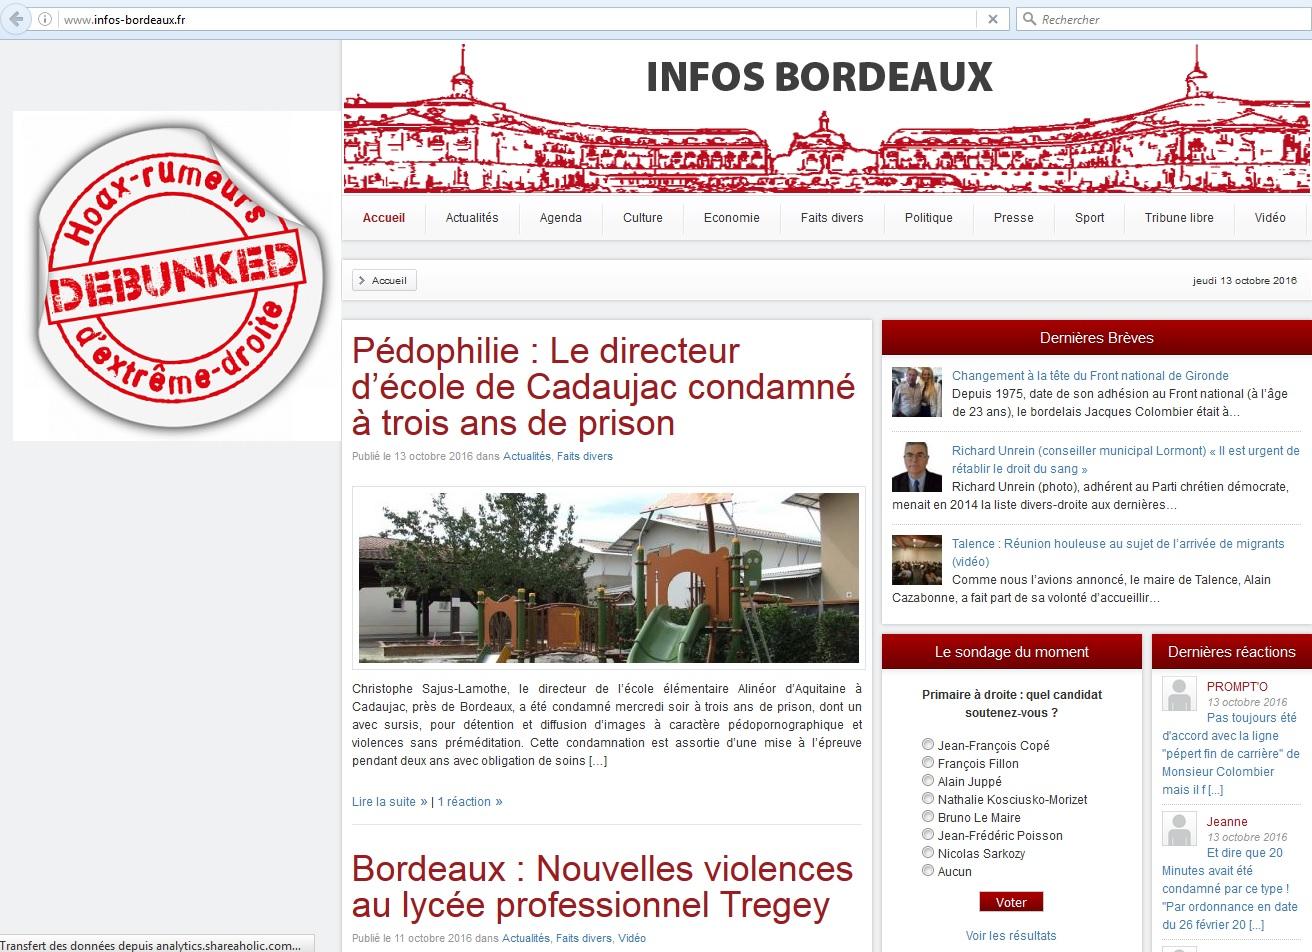 infos bordeaux.jpg